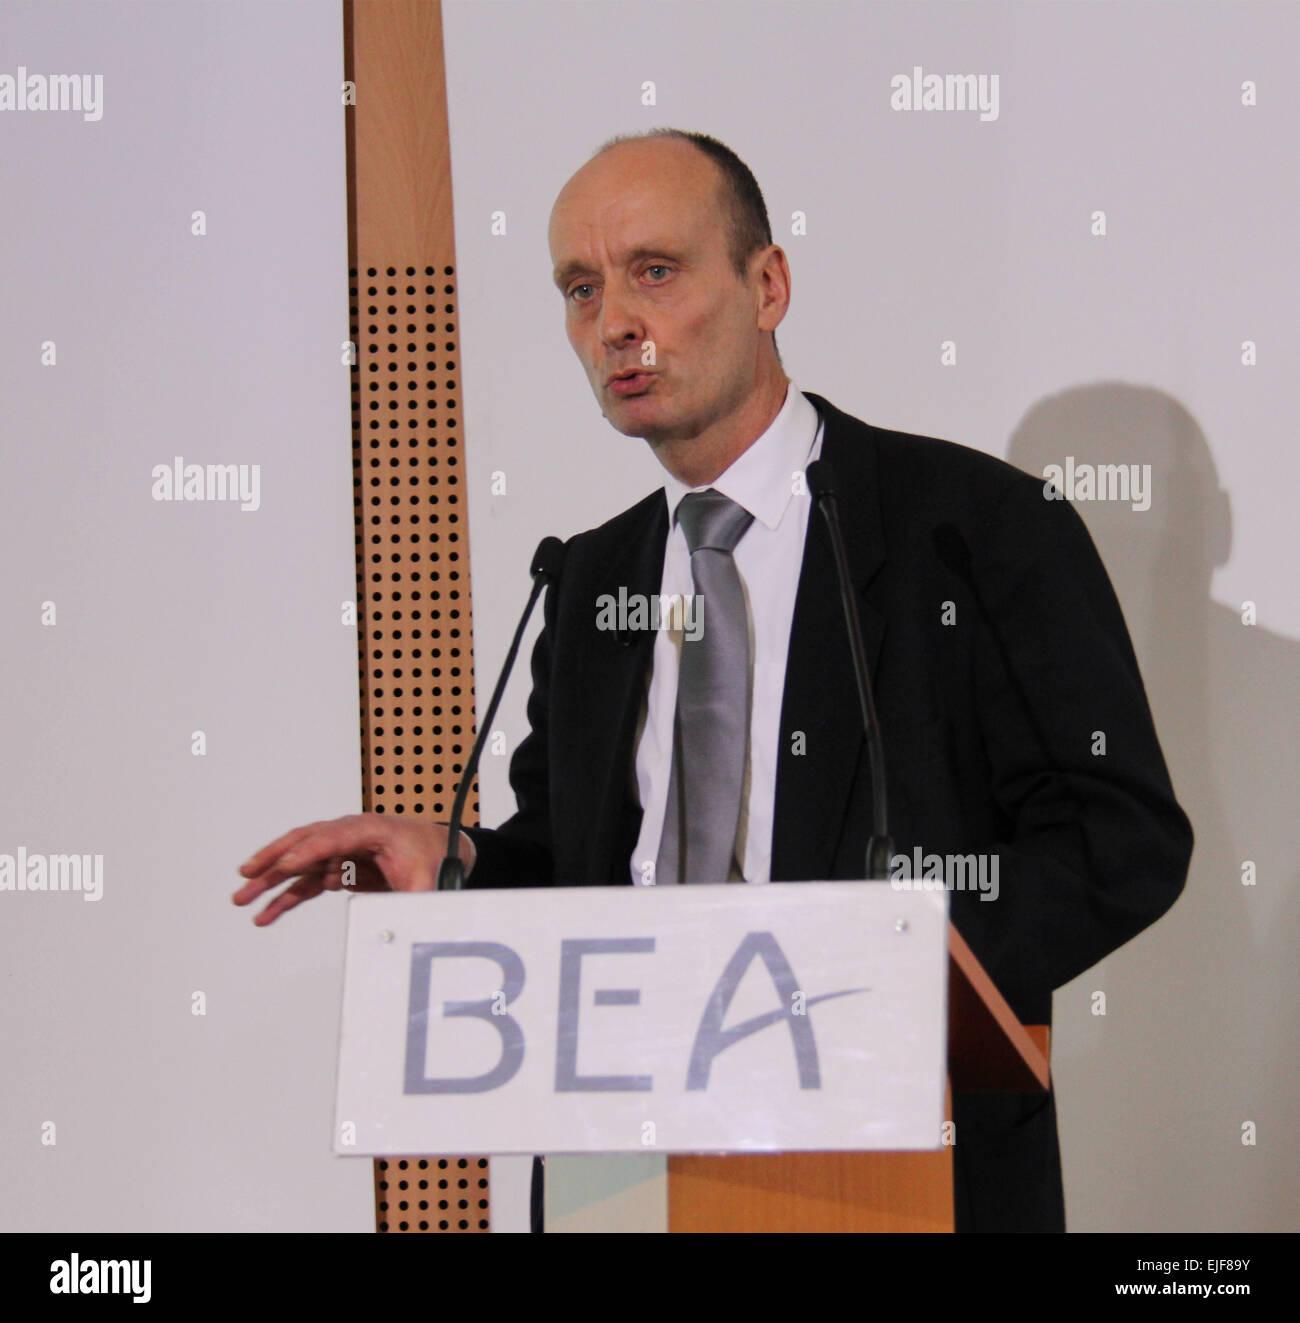 Paris, France  25th Mar, 2015  Remi Jouty, general director